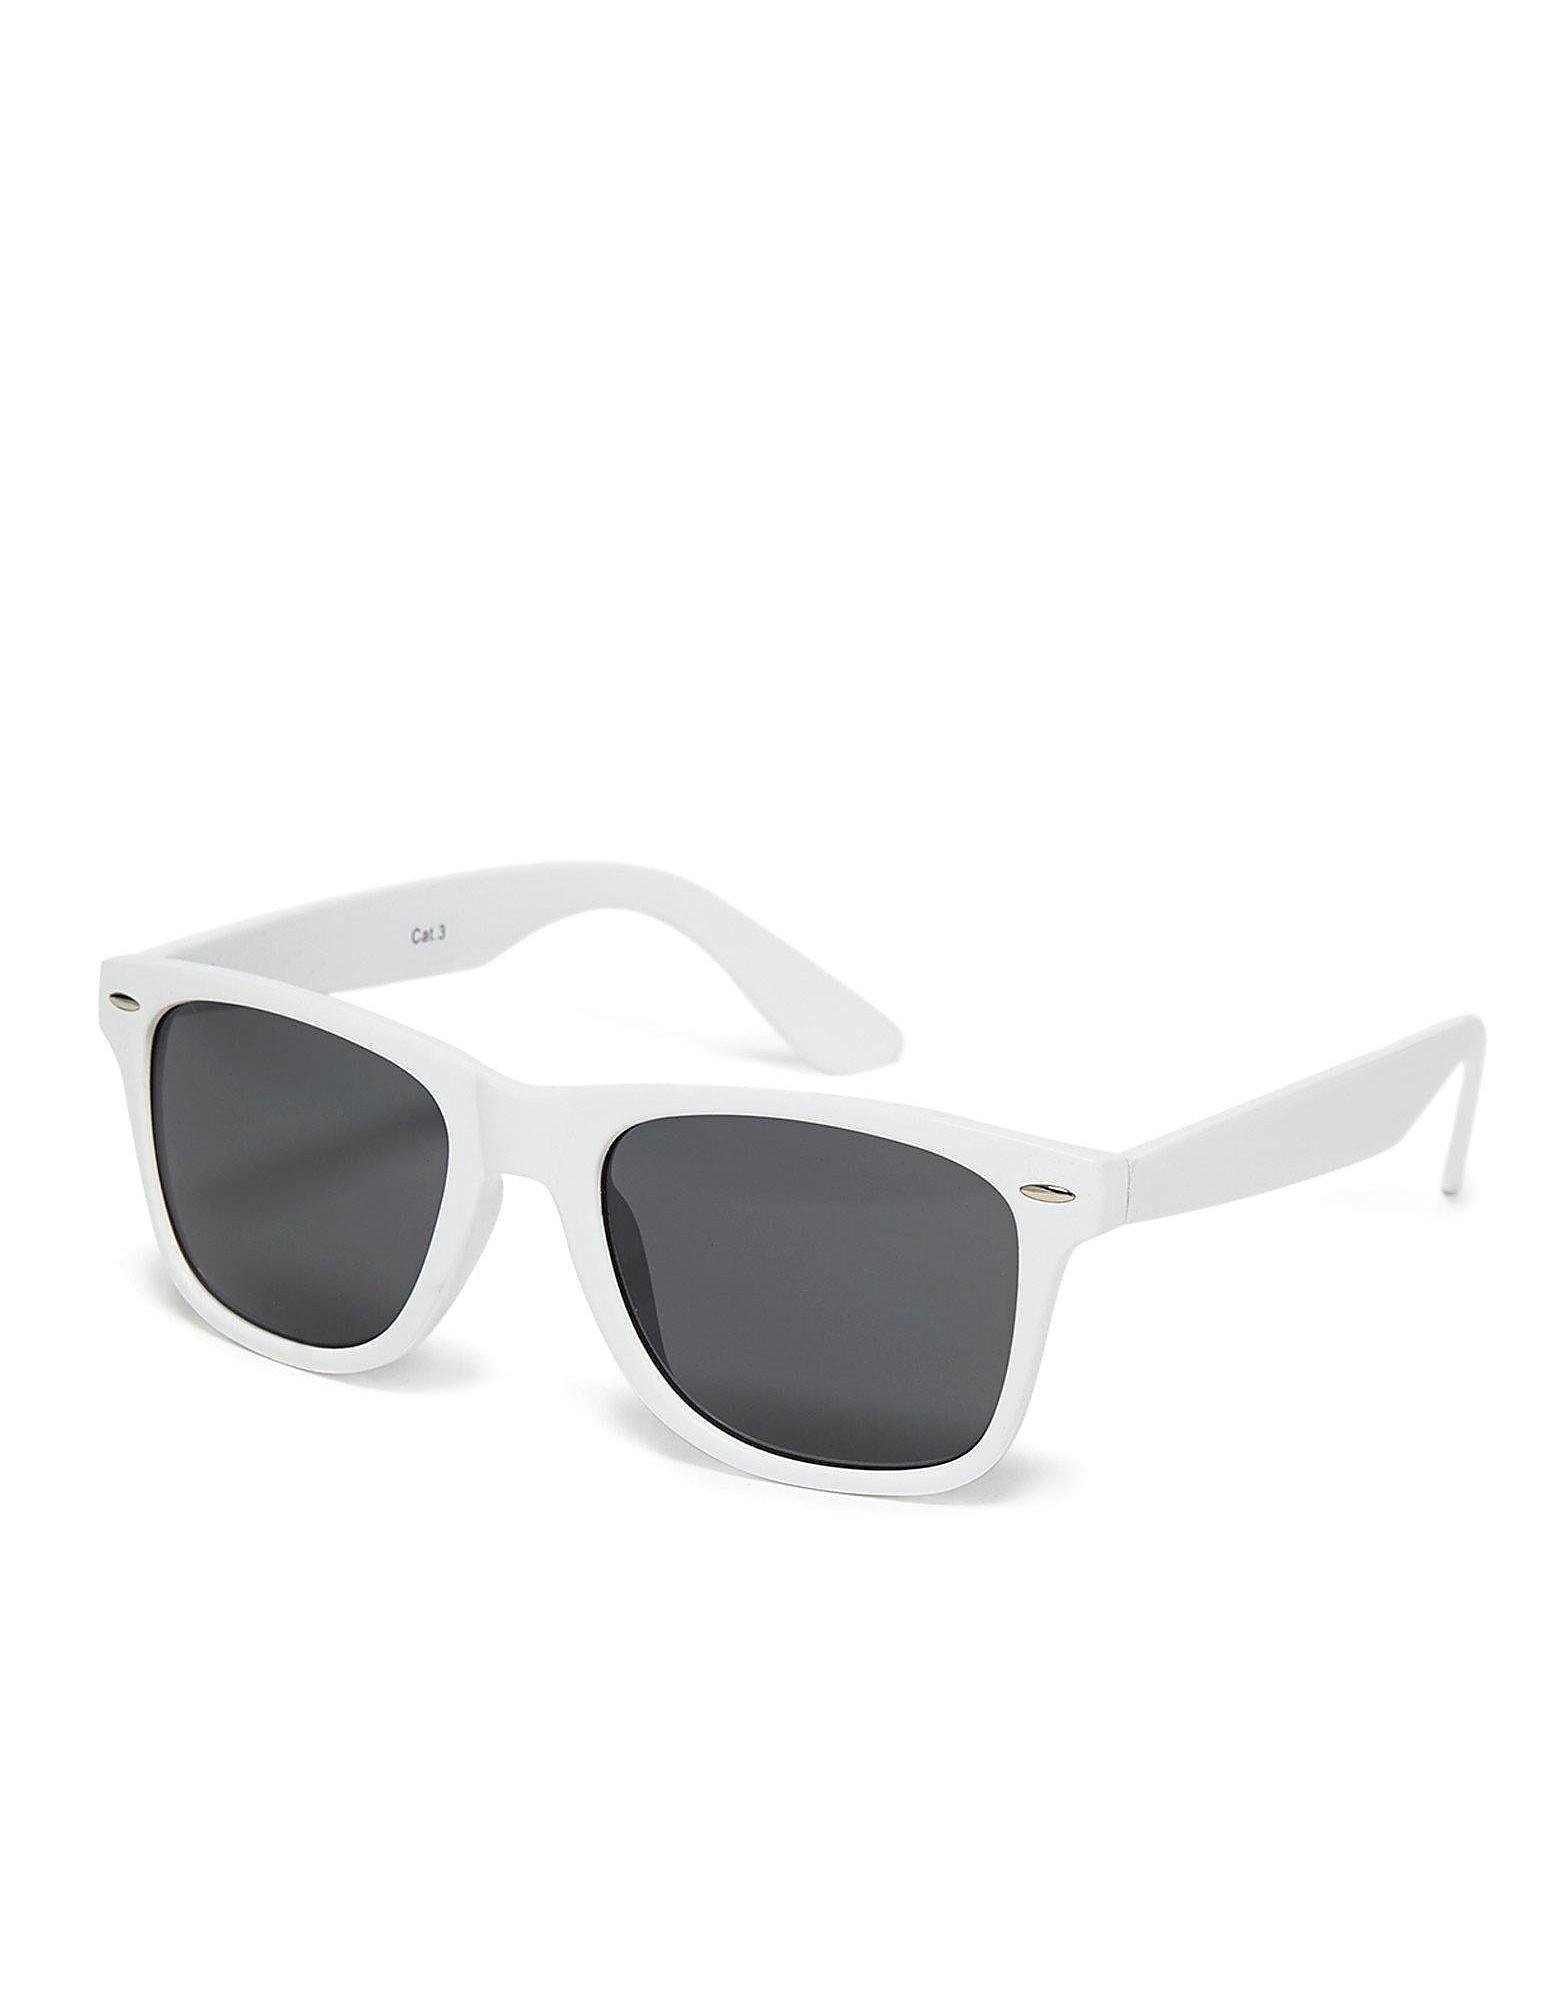 Brookhaven Caton Sunglasses - Only at JD - White - Mens, White